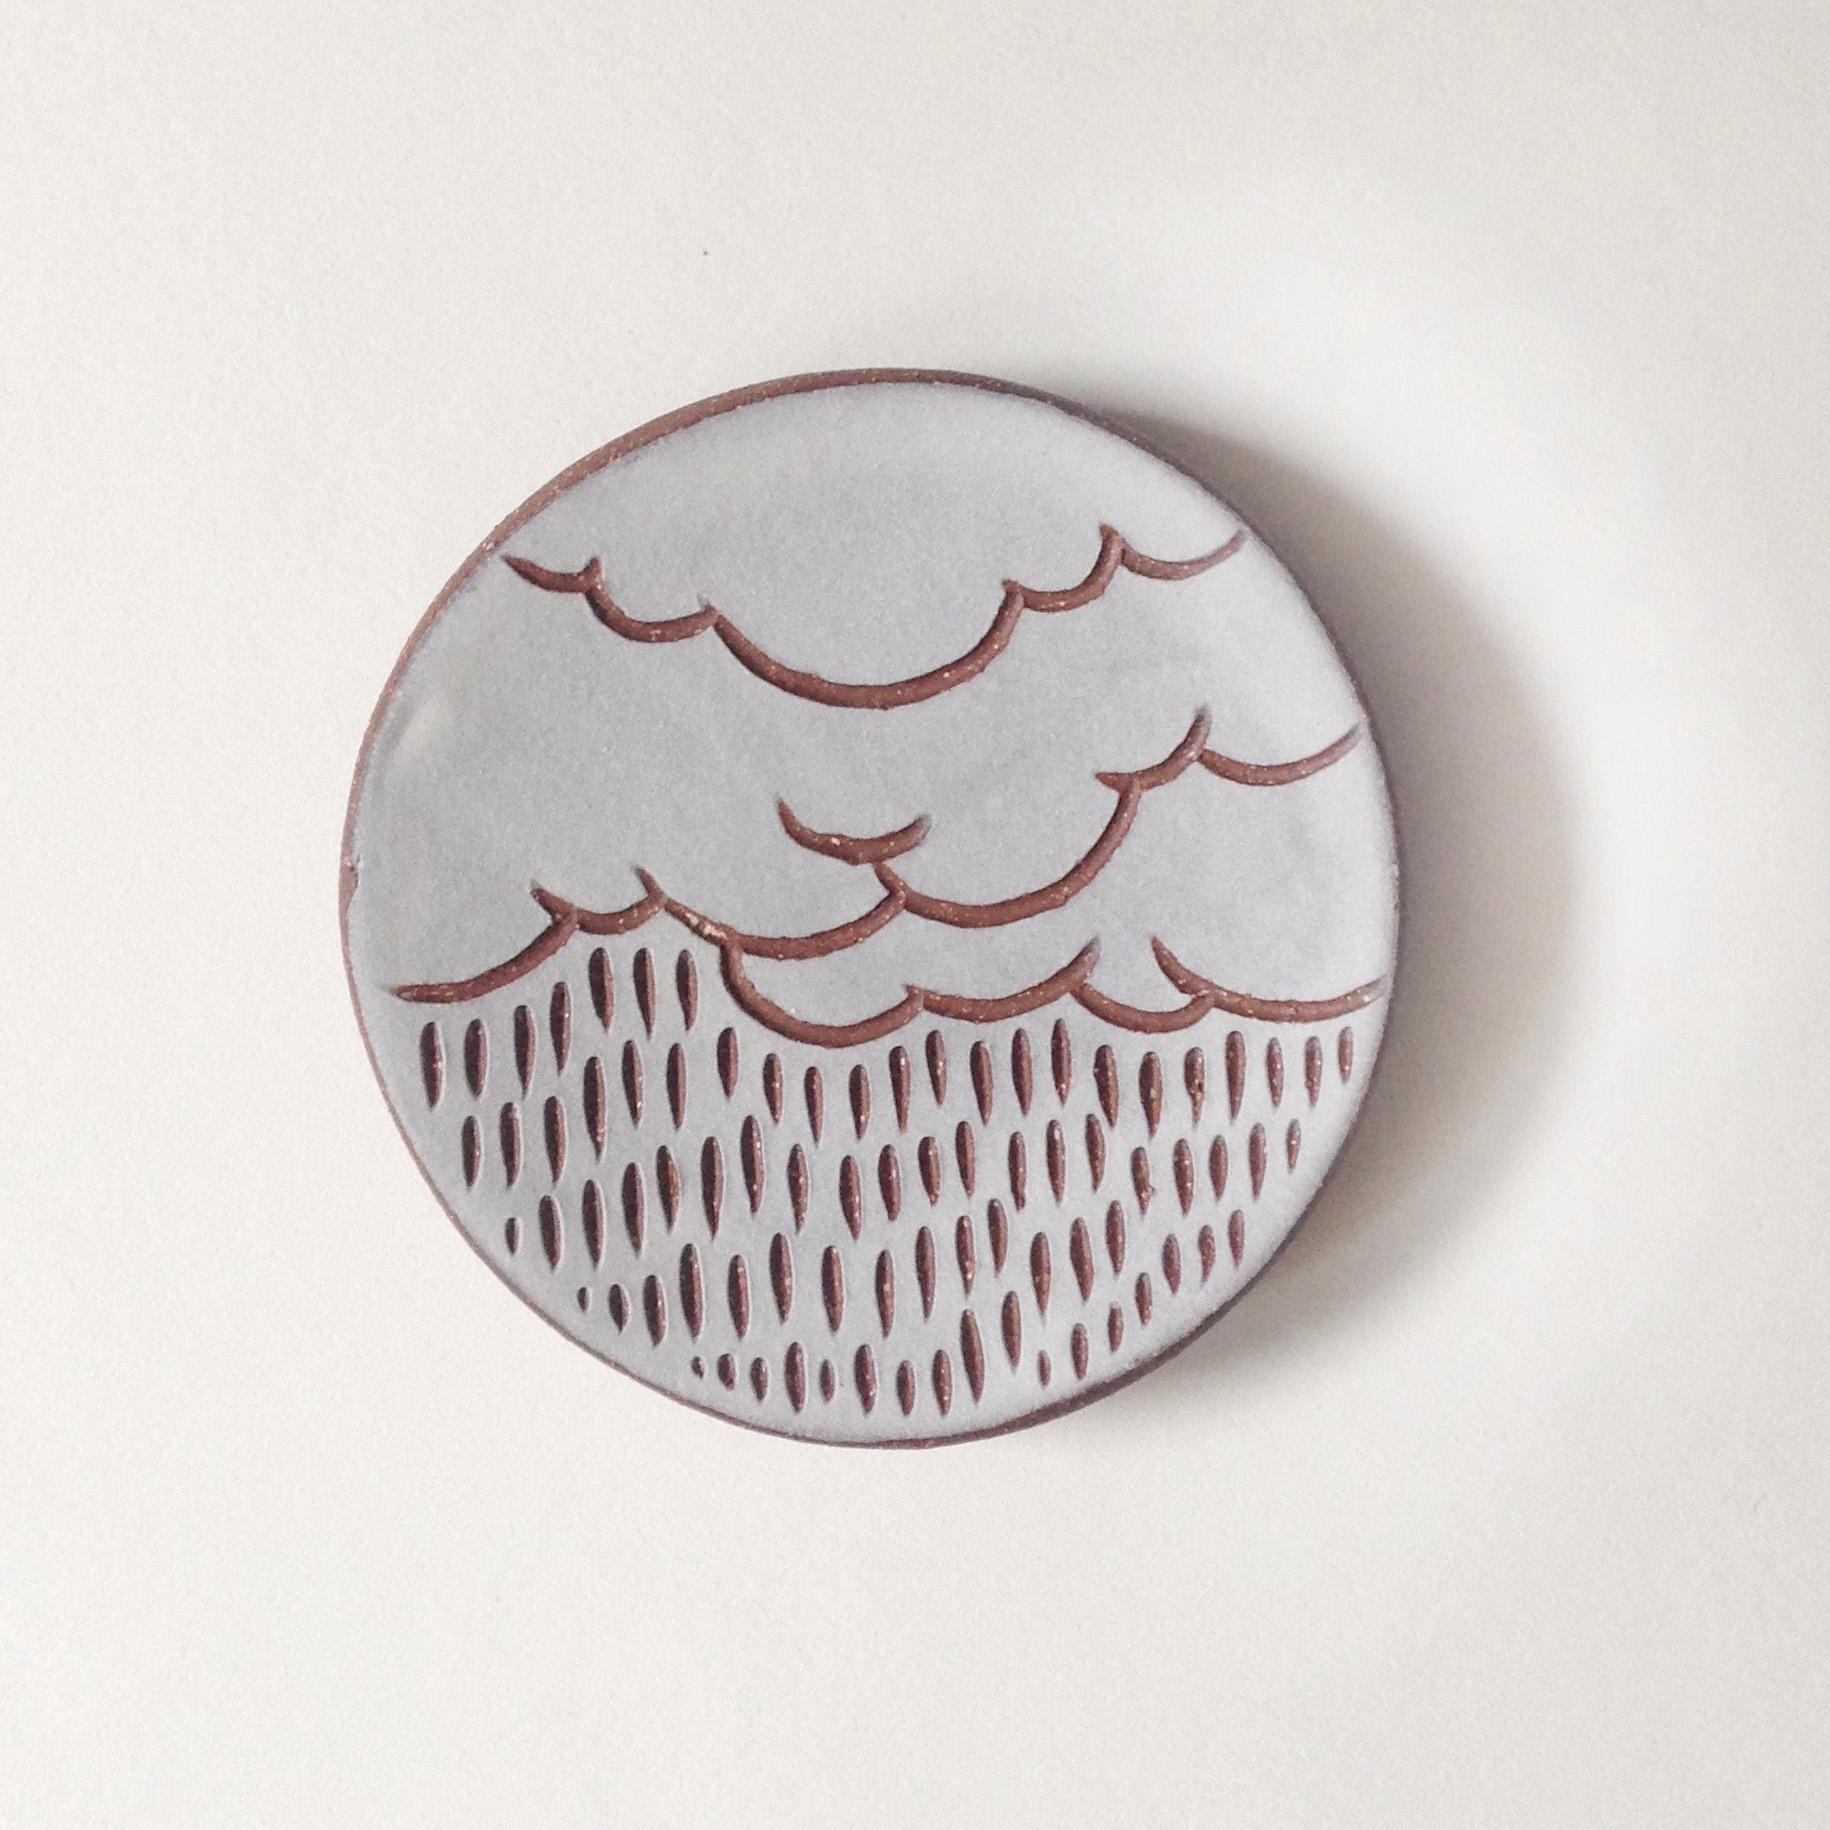 Cloud ring dish